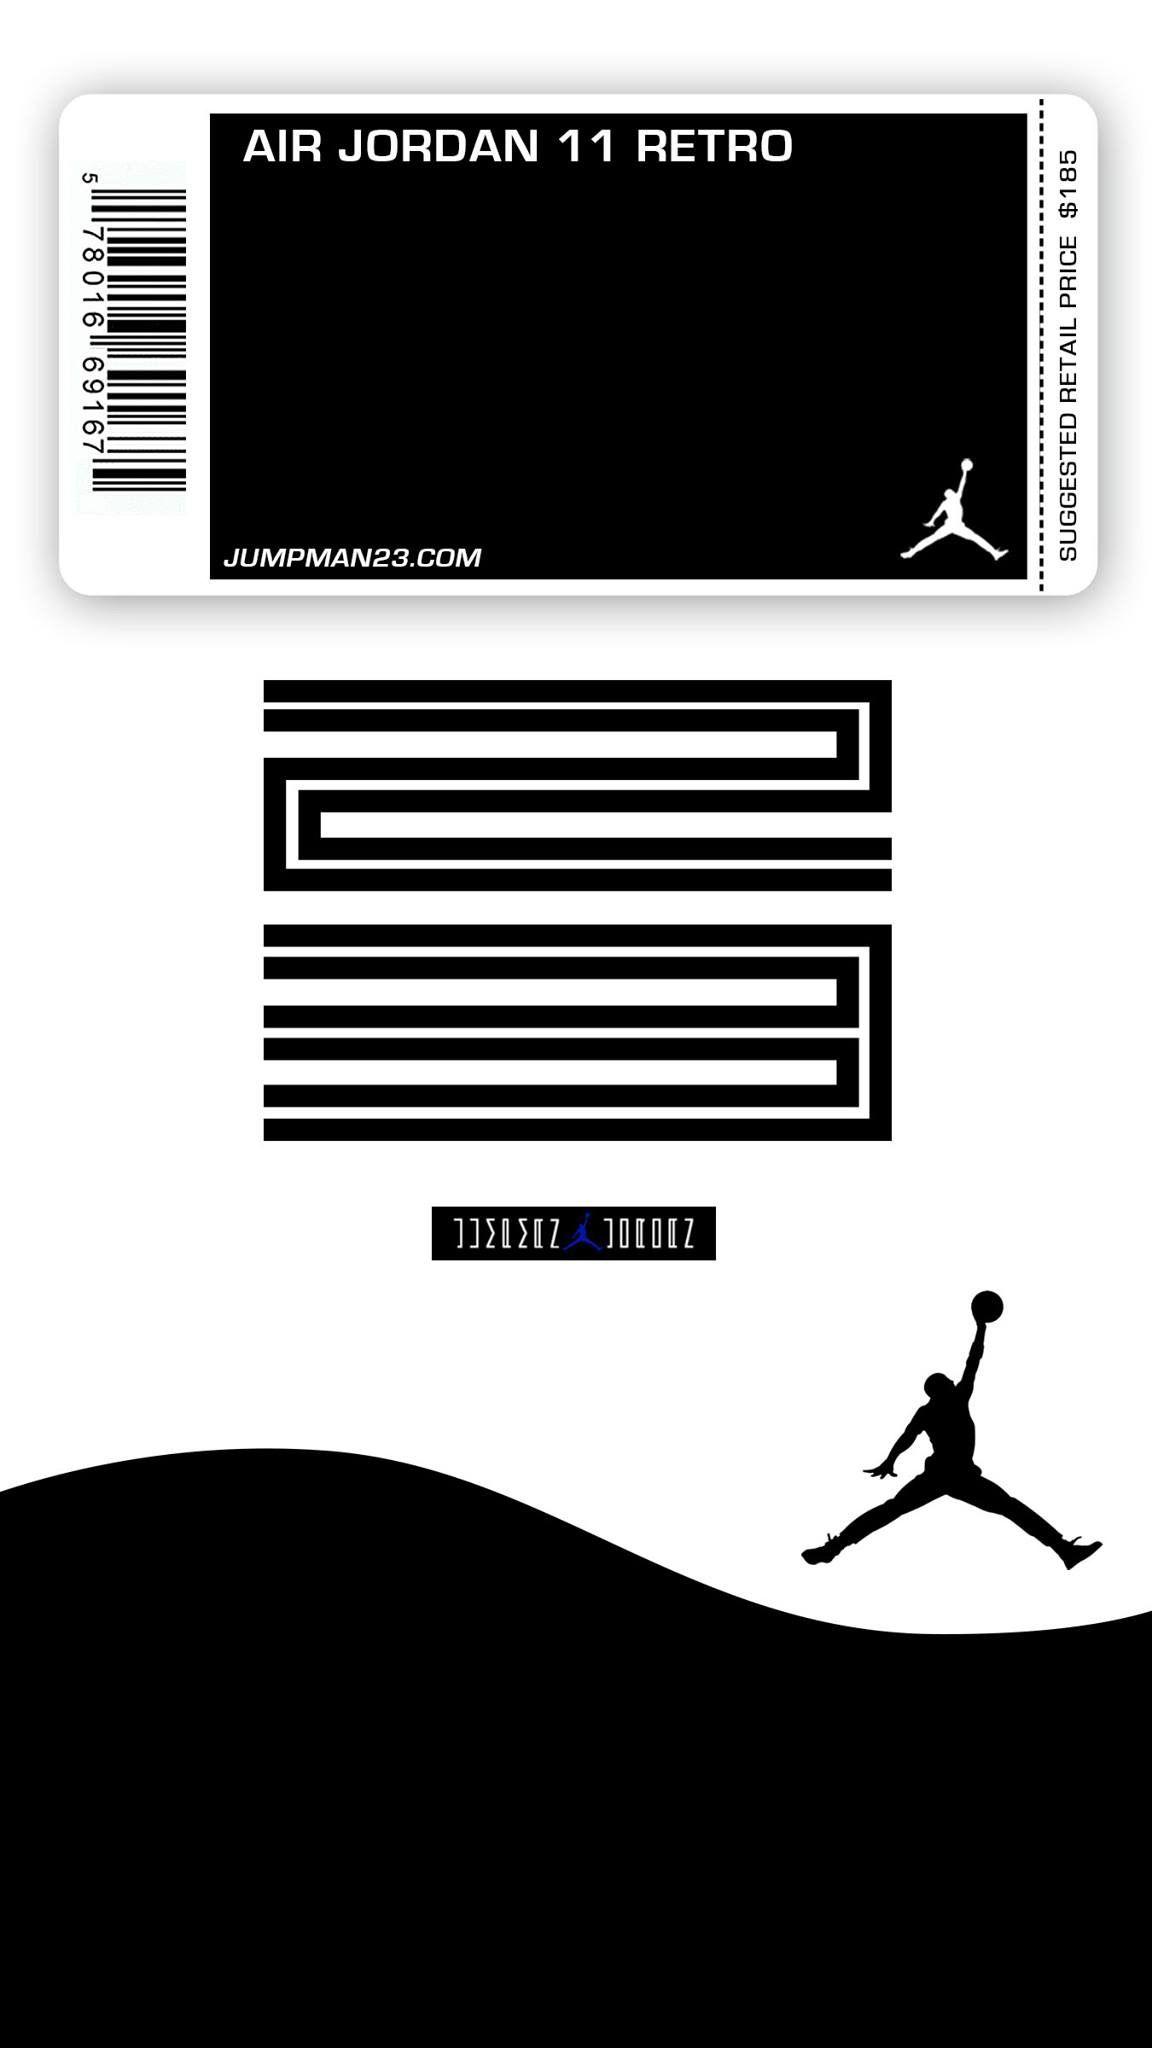 Jordan 11 concords mobile wallpaper · LitsChaussureFonds D'écran ...